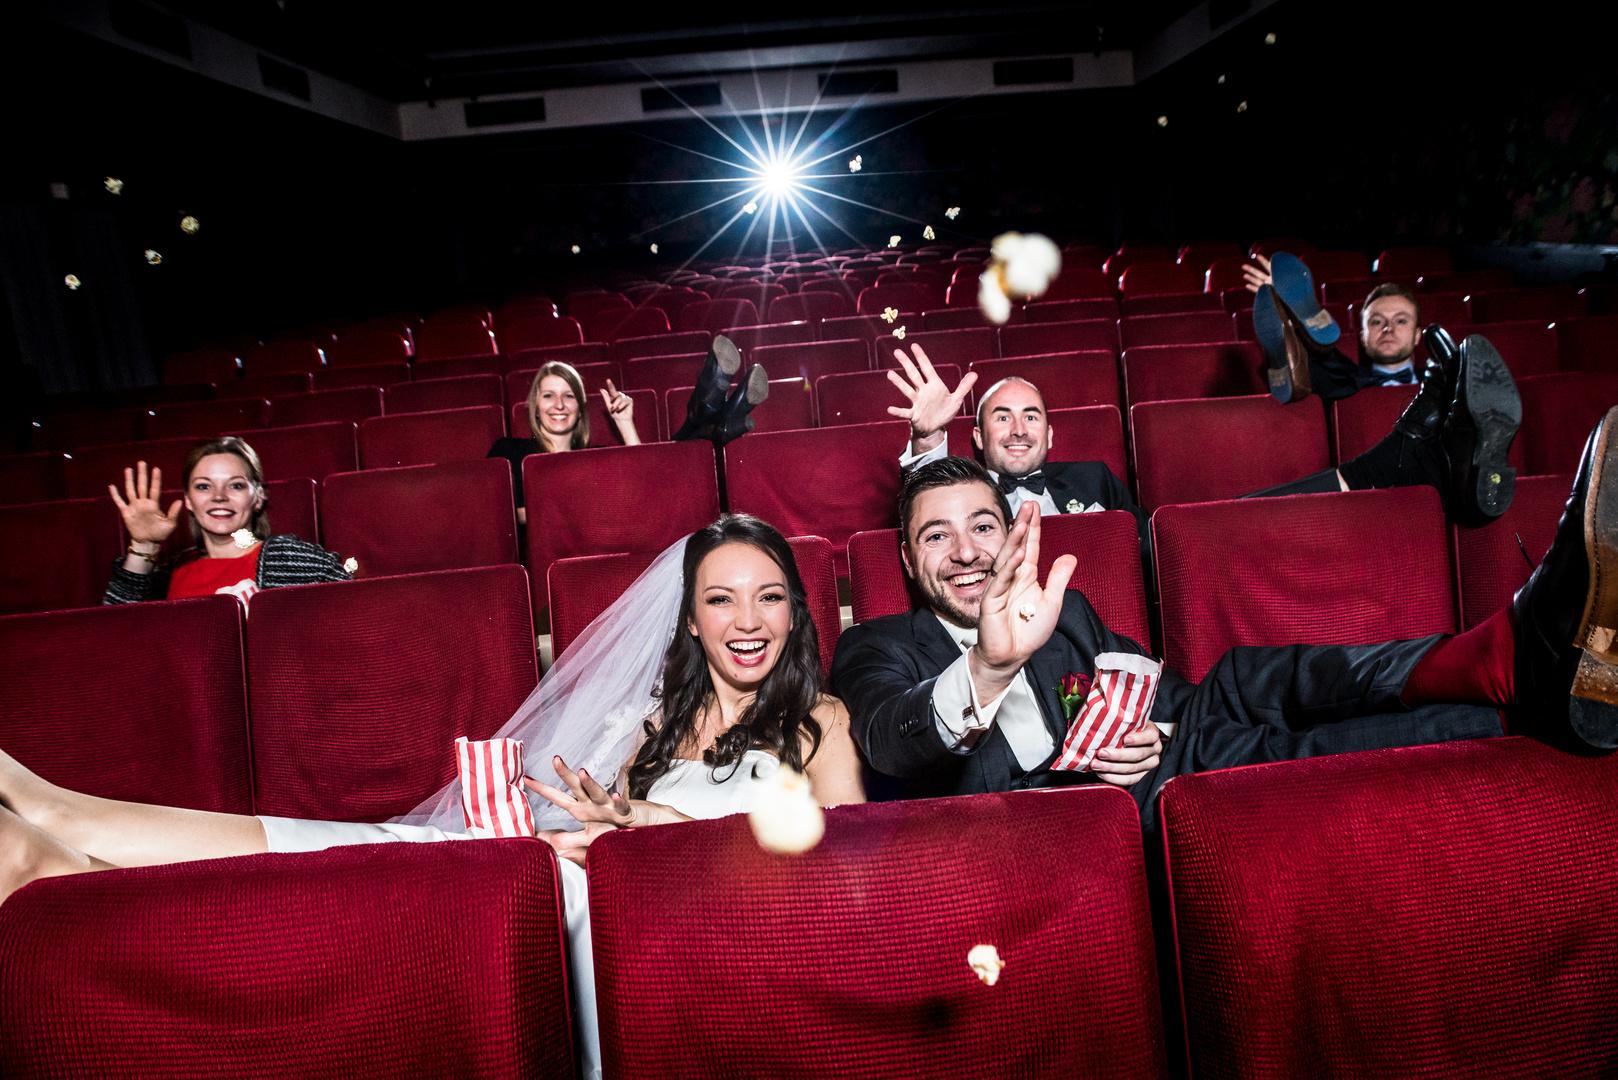 Hochzeitsfoto im Kino